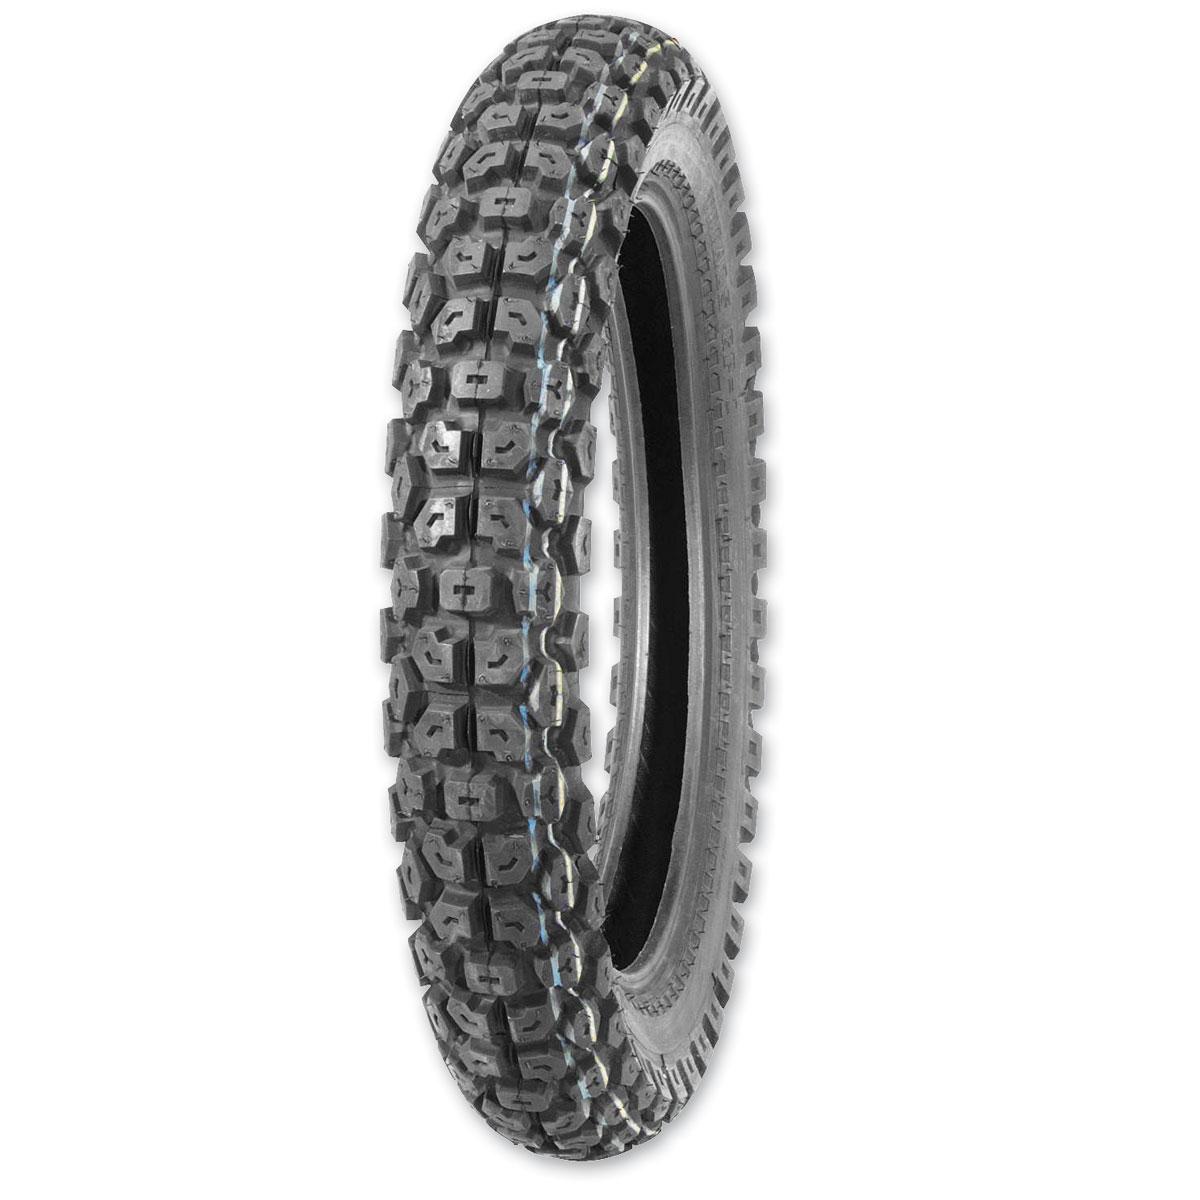 IRC GP1 4.60-17 Rear Tire